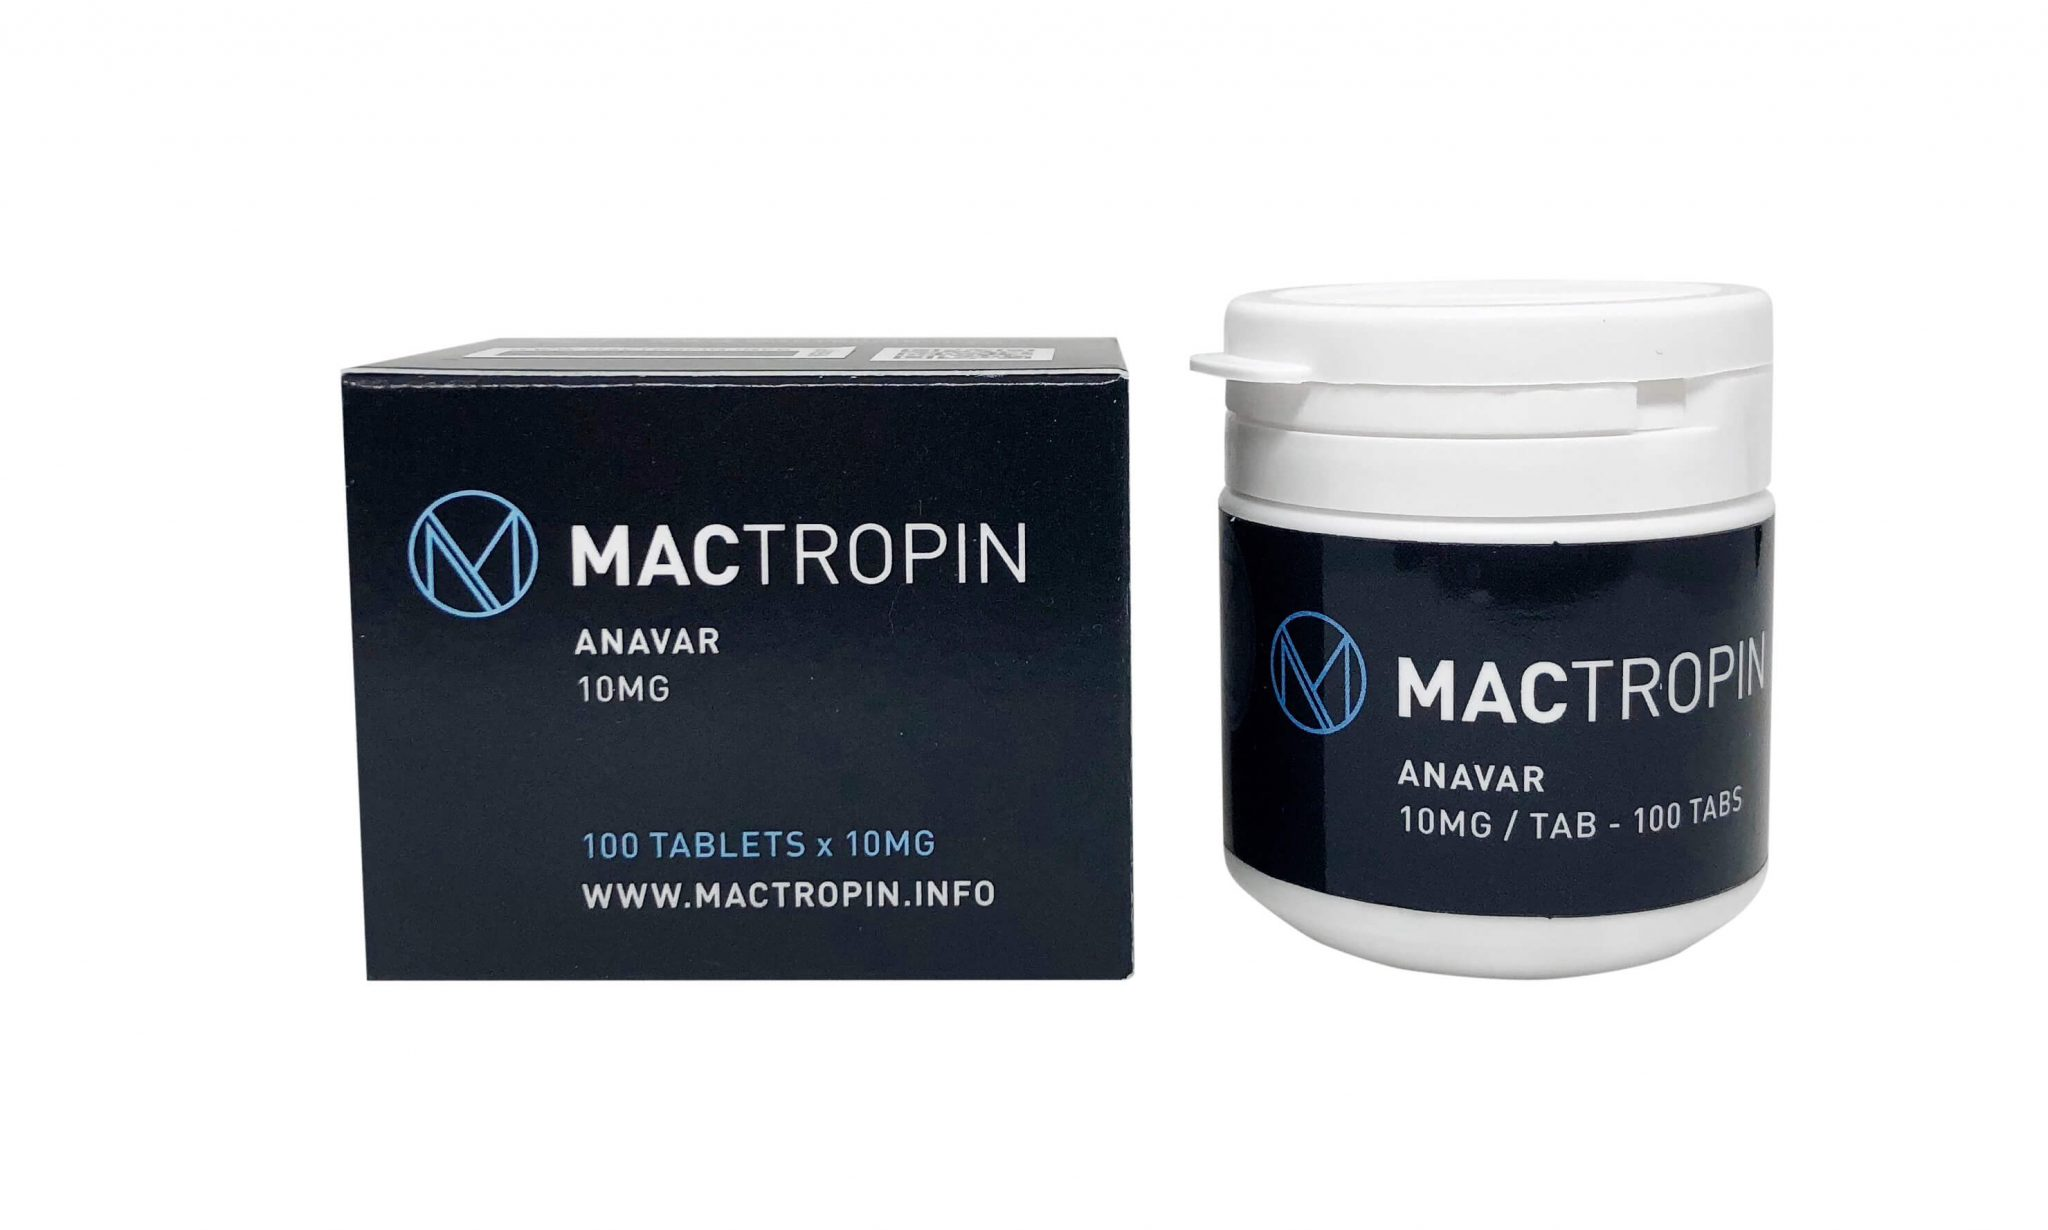 Anavar - Mactropin - 10mg - Boîte de 100tabs - LeCoqMusclé.com